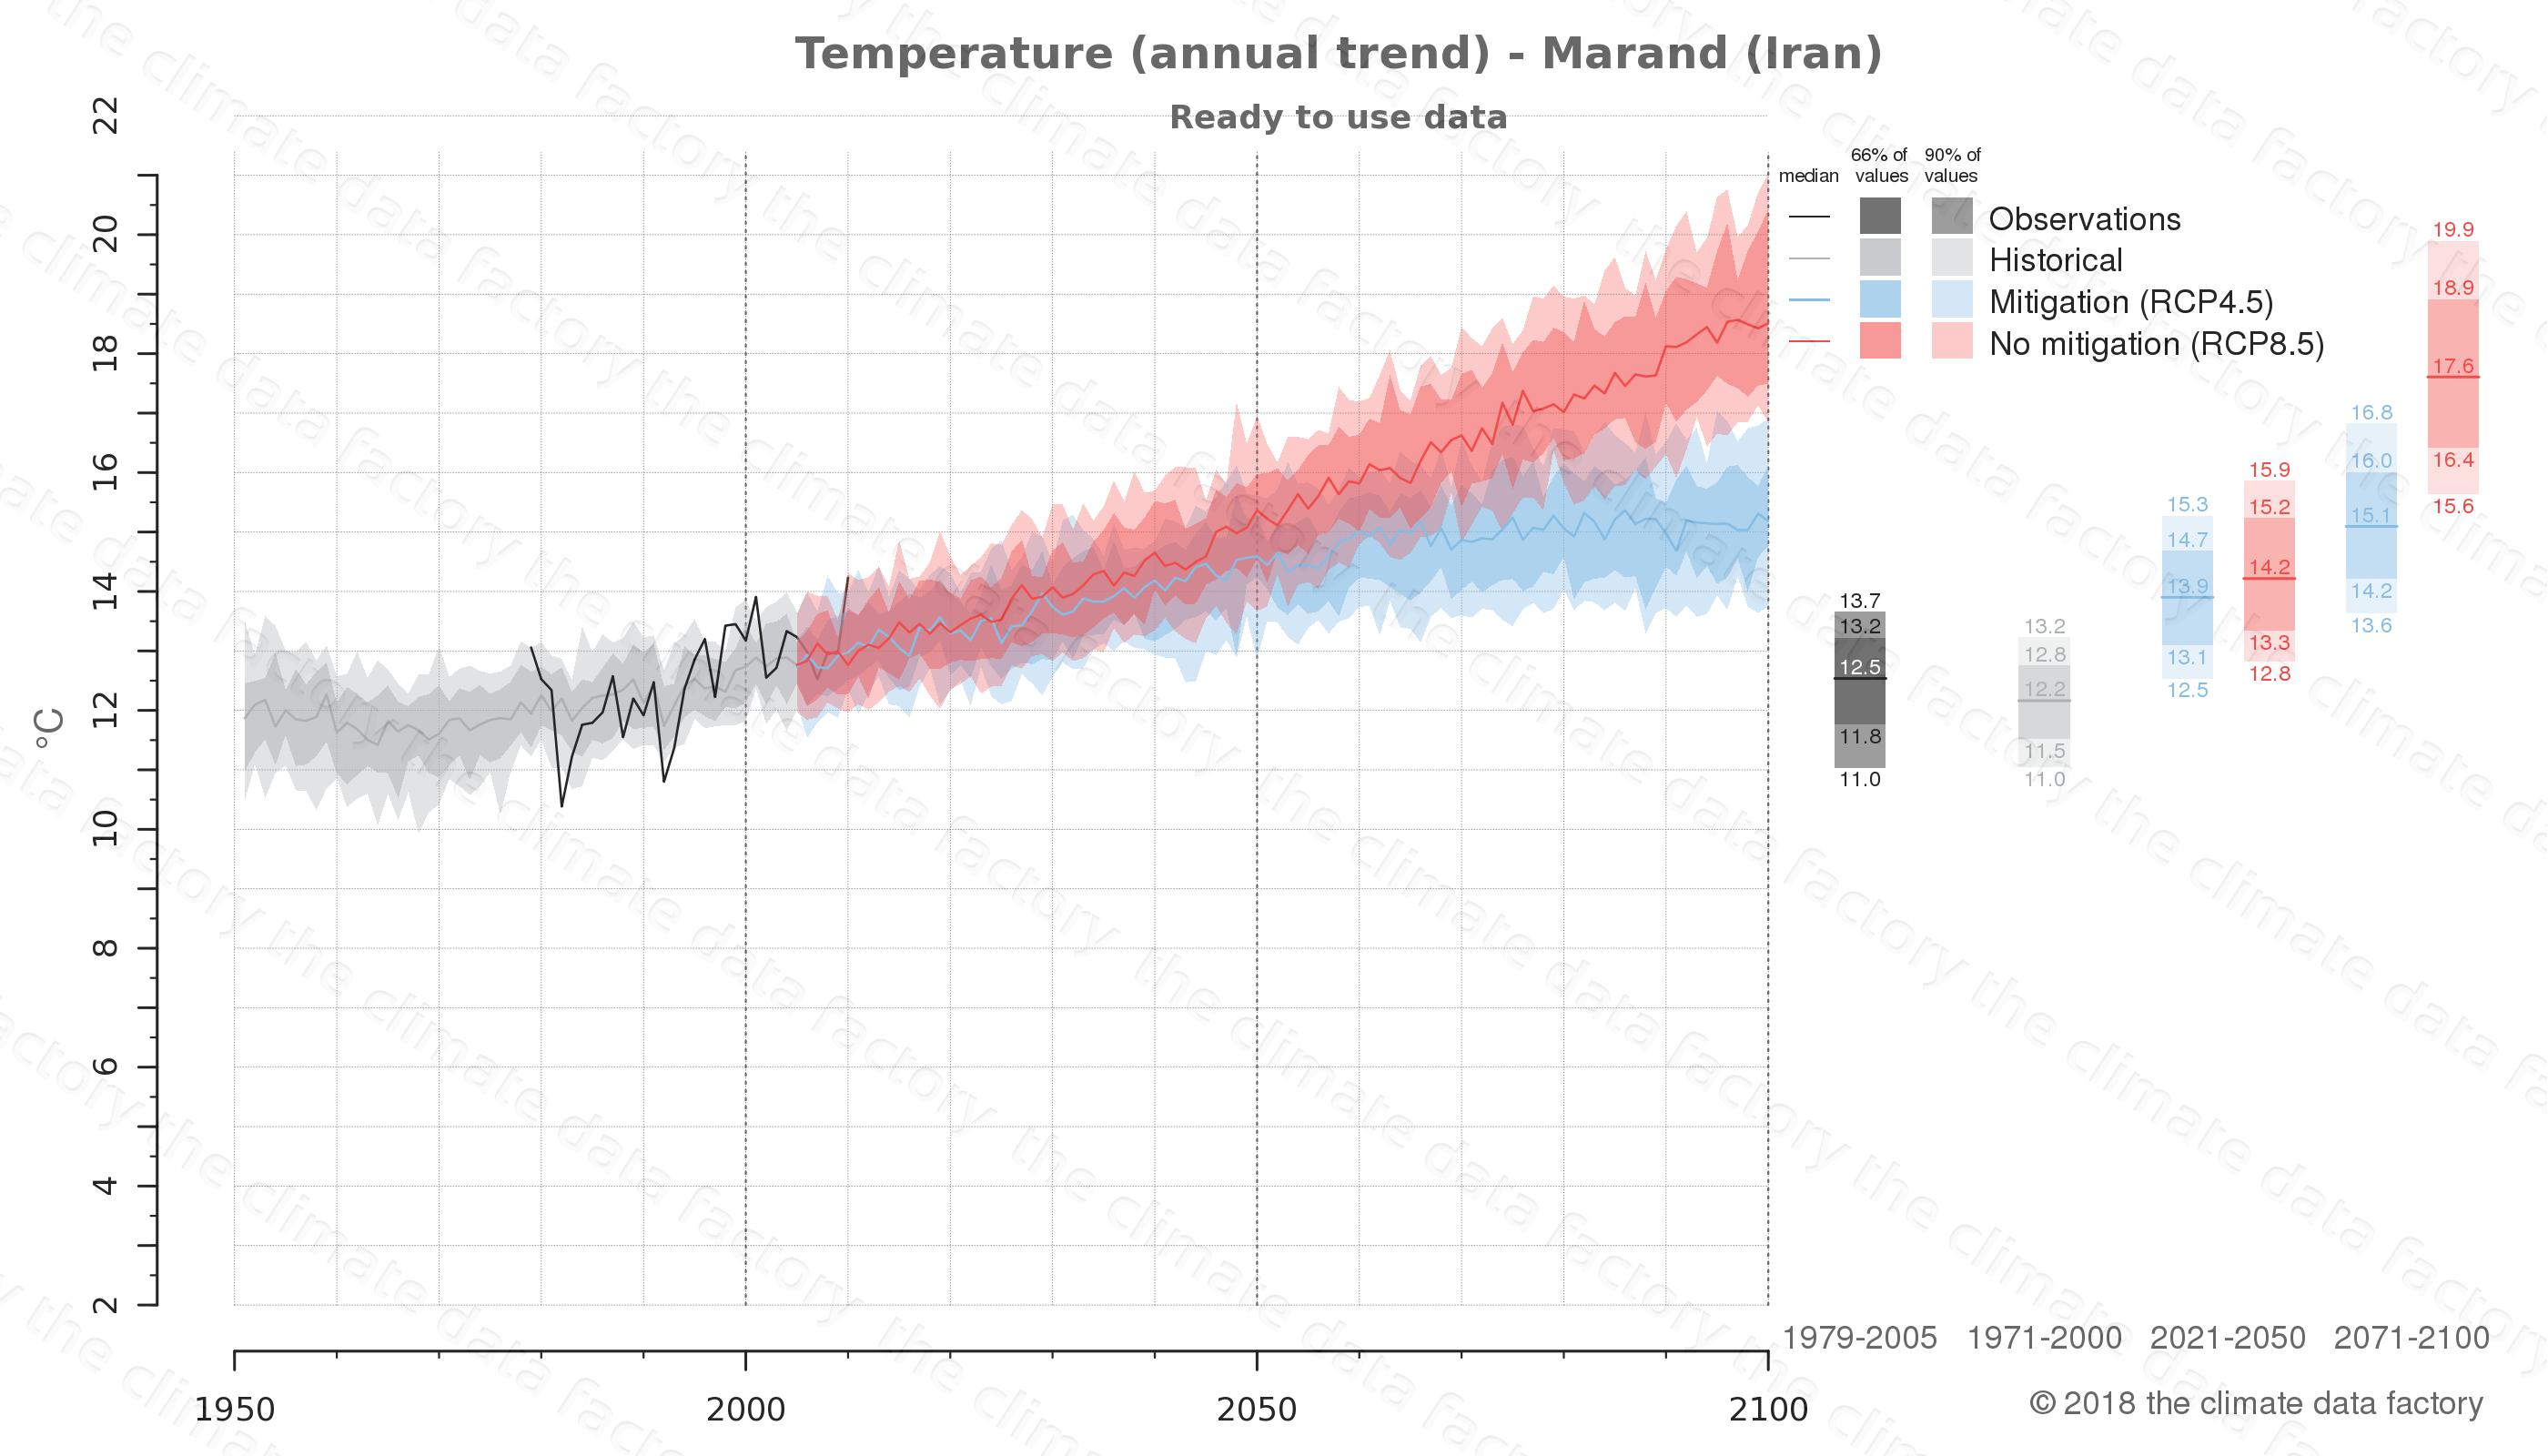 climate change data policy adaptation climate graph city data temperature marand iran